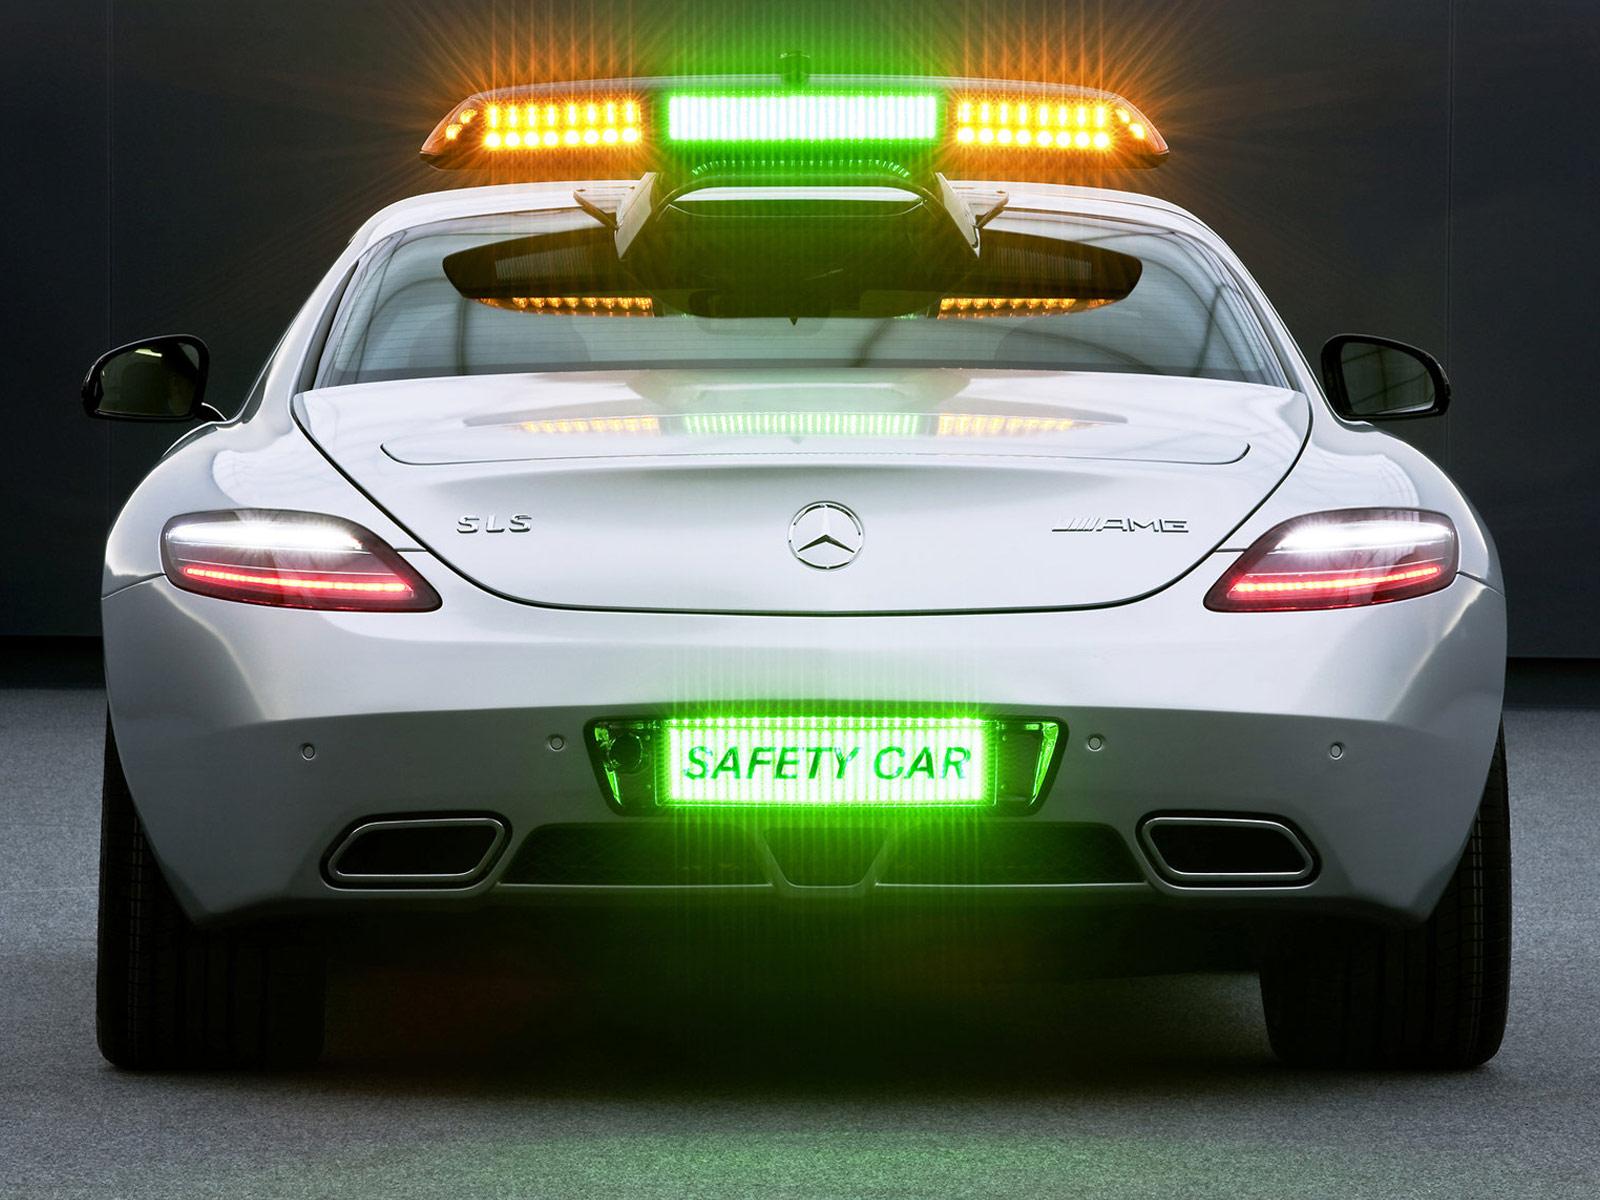 MERCEDES BENZ SLS AMG F1 Safety Car desktop wallpaper Amusing Web 1600x1200